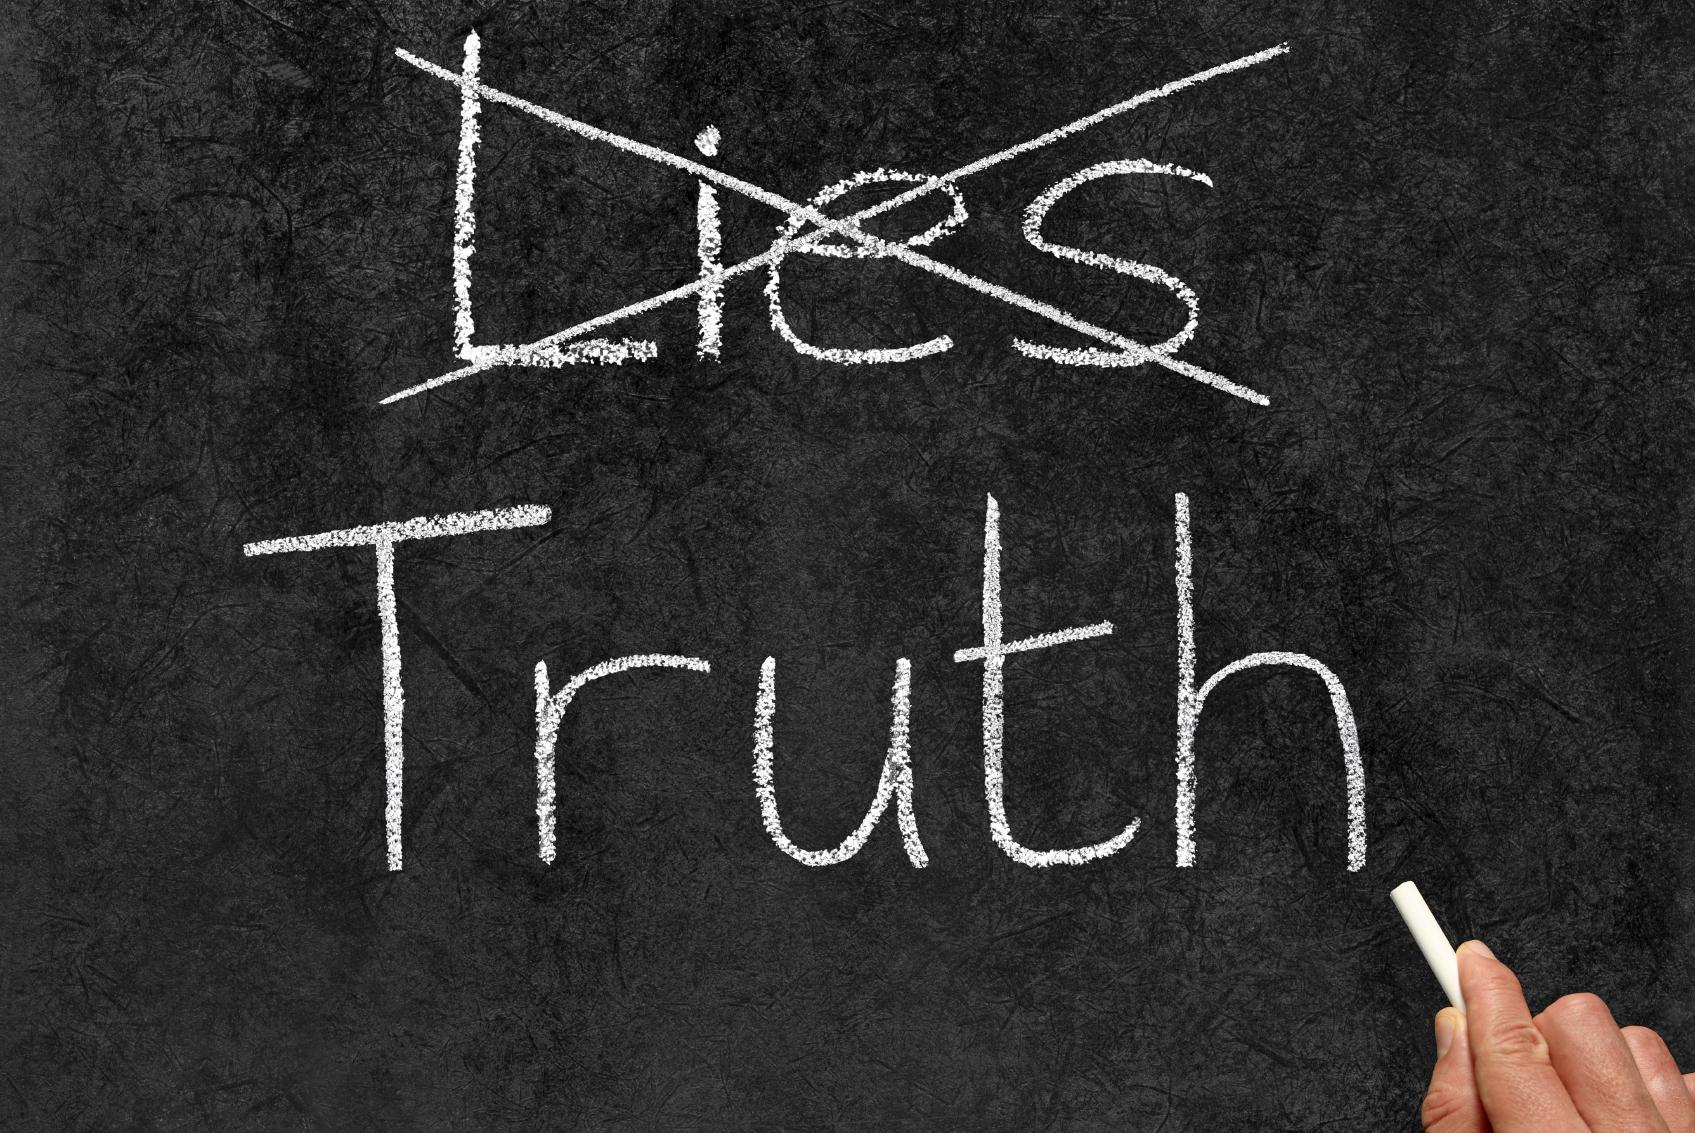 a nation of lies